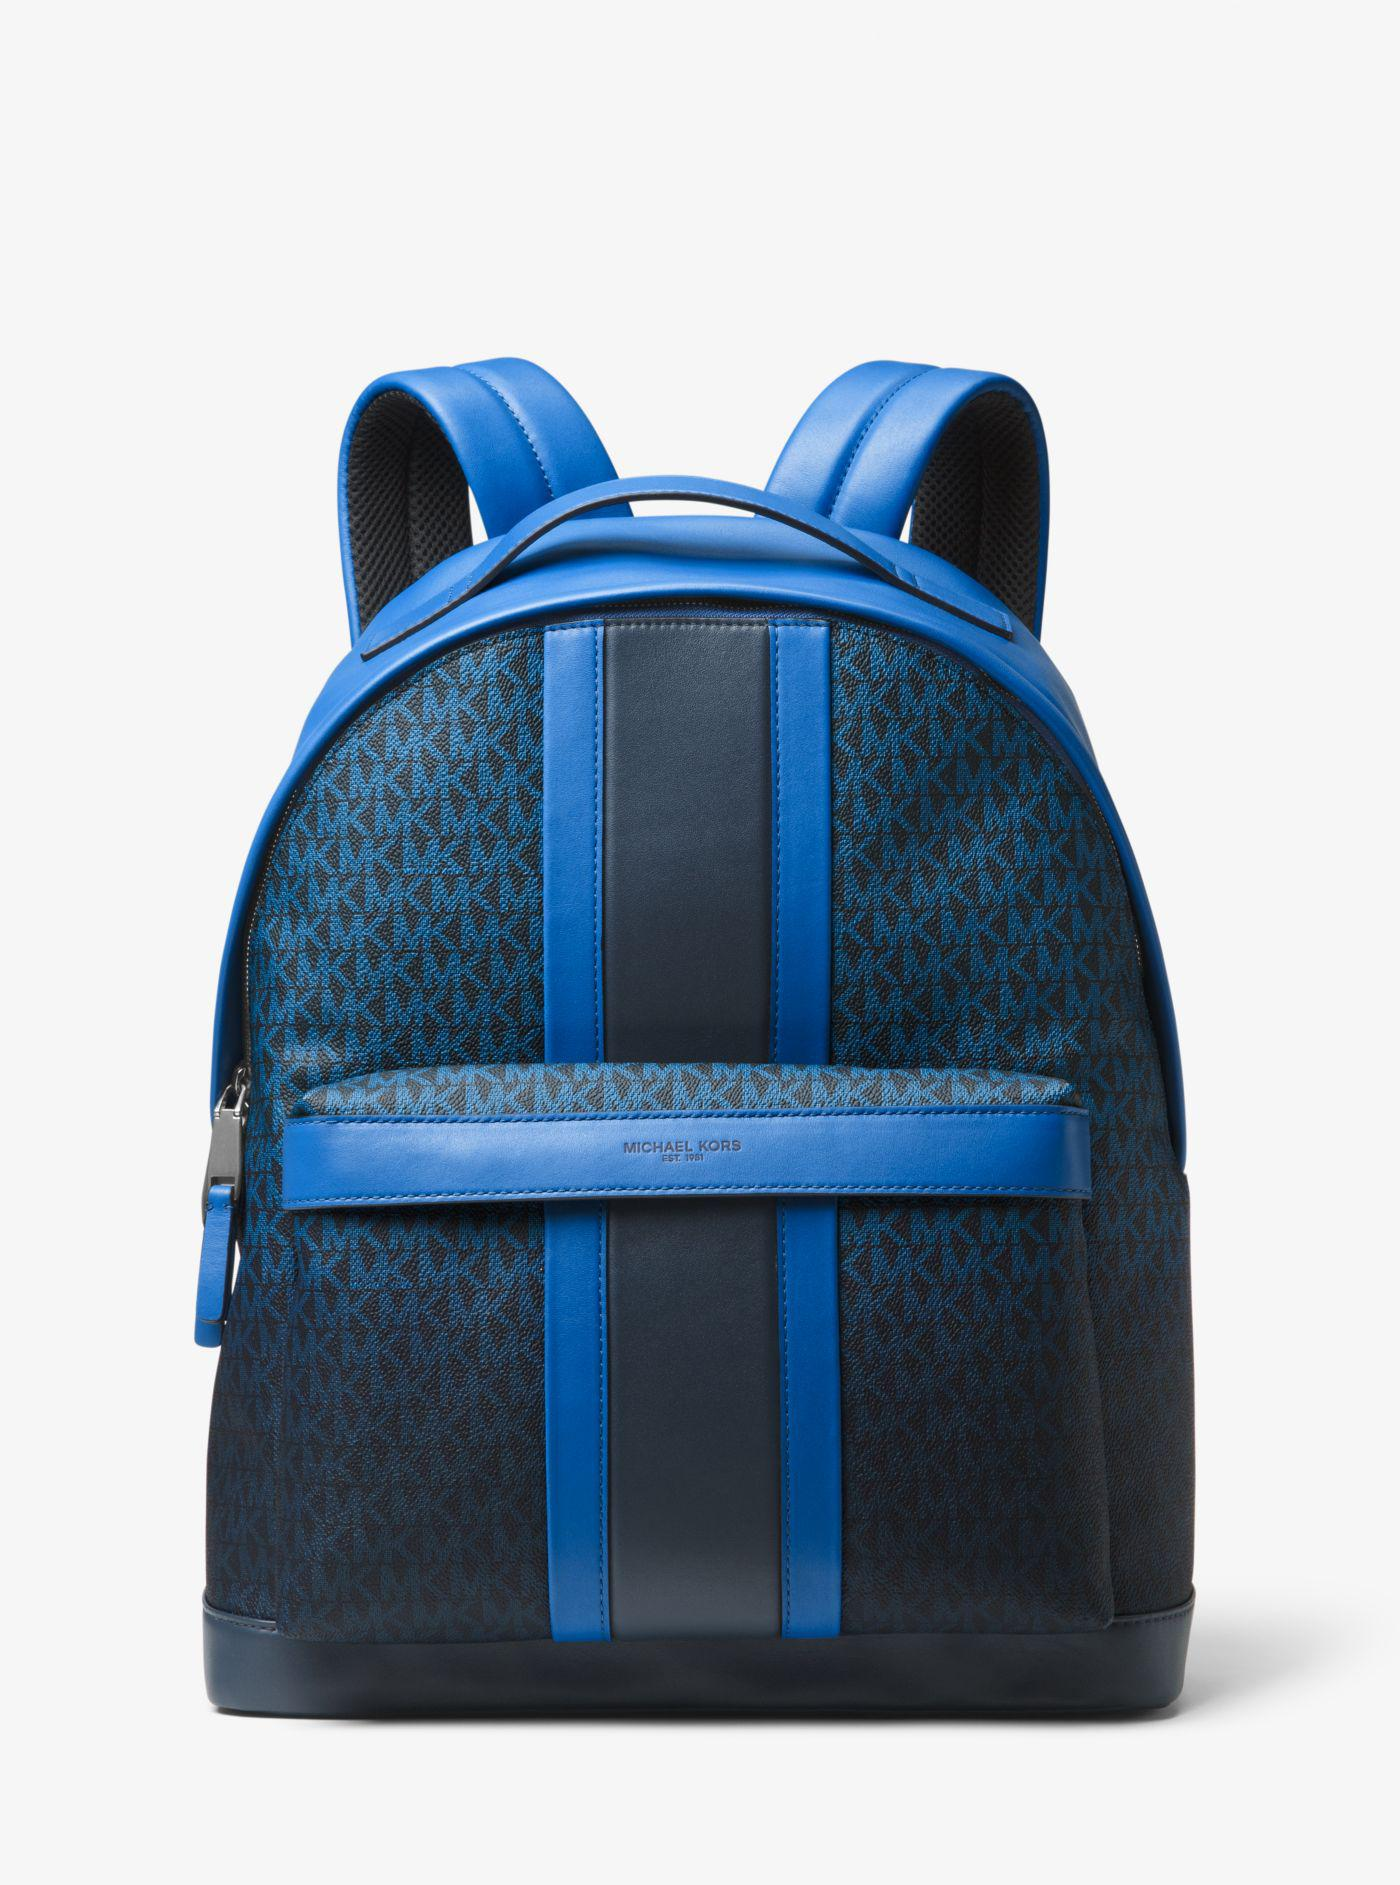 e2b49dc16f14 ... discount lyst michael kors odin logo stripe backpack in blue for men  c00ac e1a6f ...